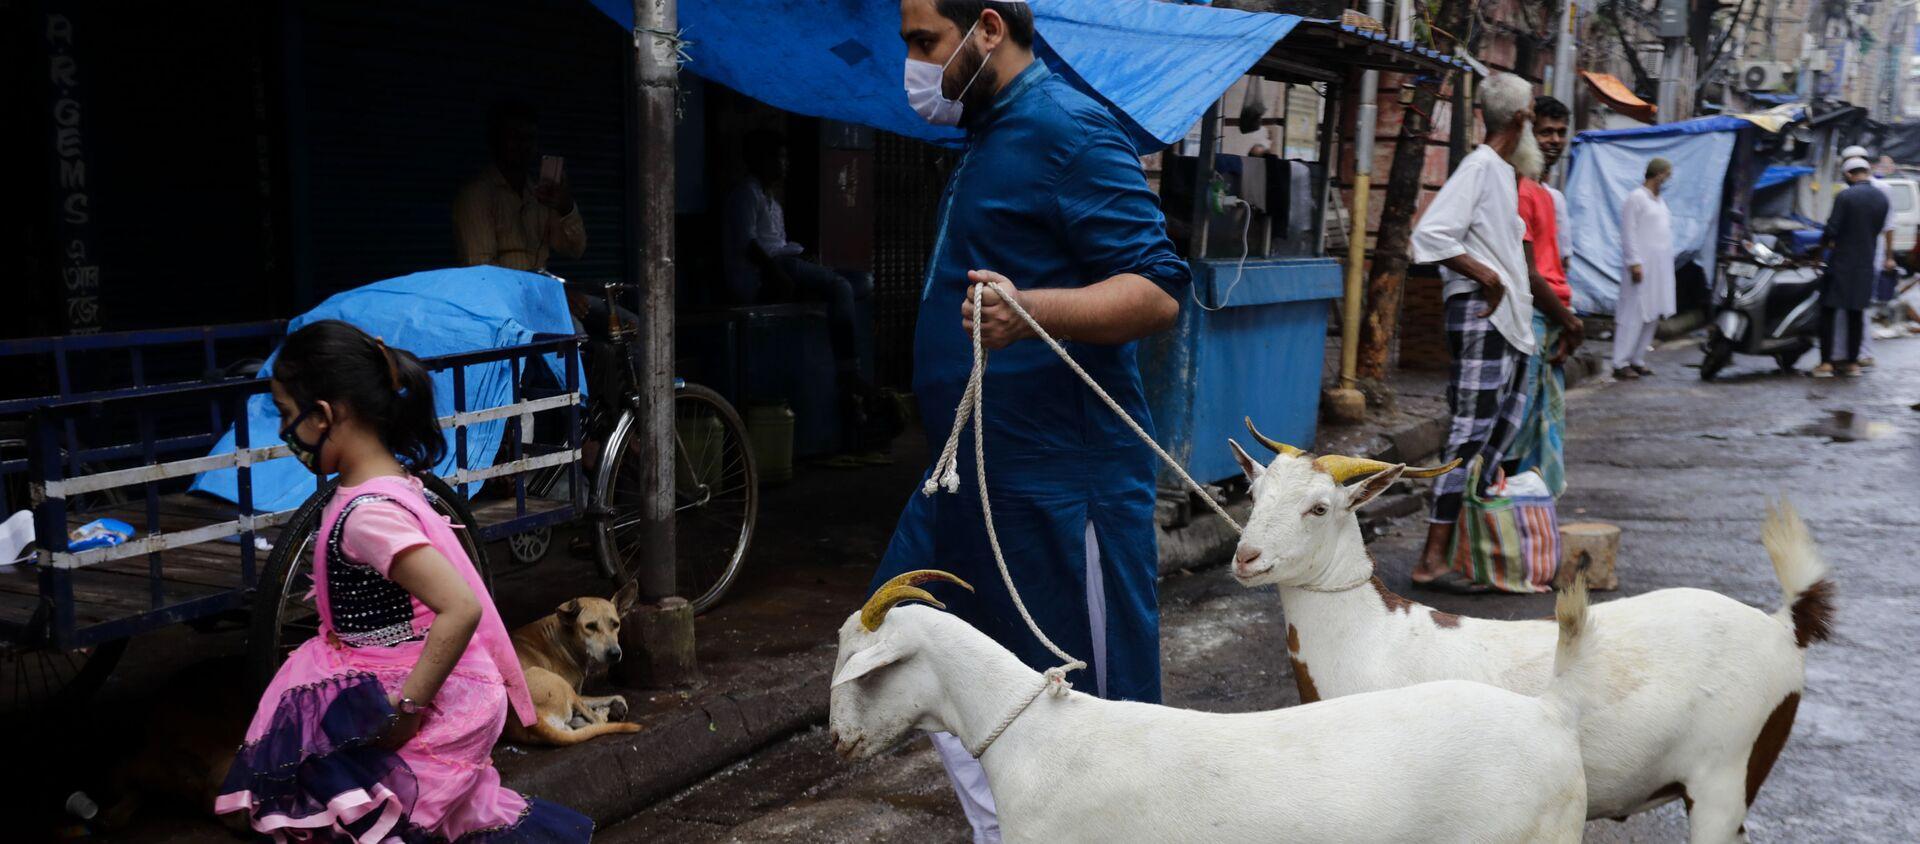 A Muslim walks with goats for sacrifice during Eid al-Adha festival in Kolkata, India, Wednesday, July 21, 2021 - Sputnik International, 1920